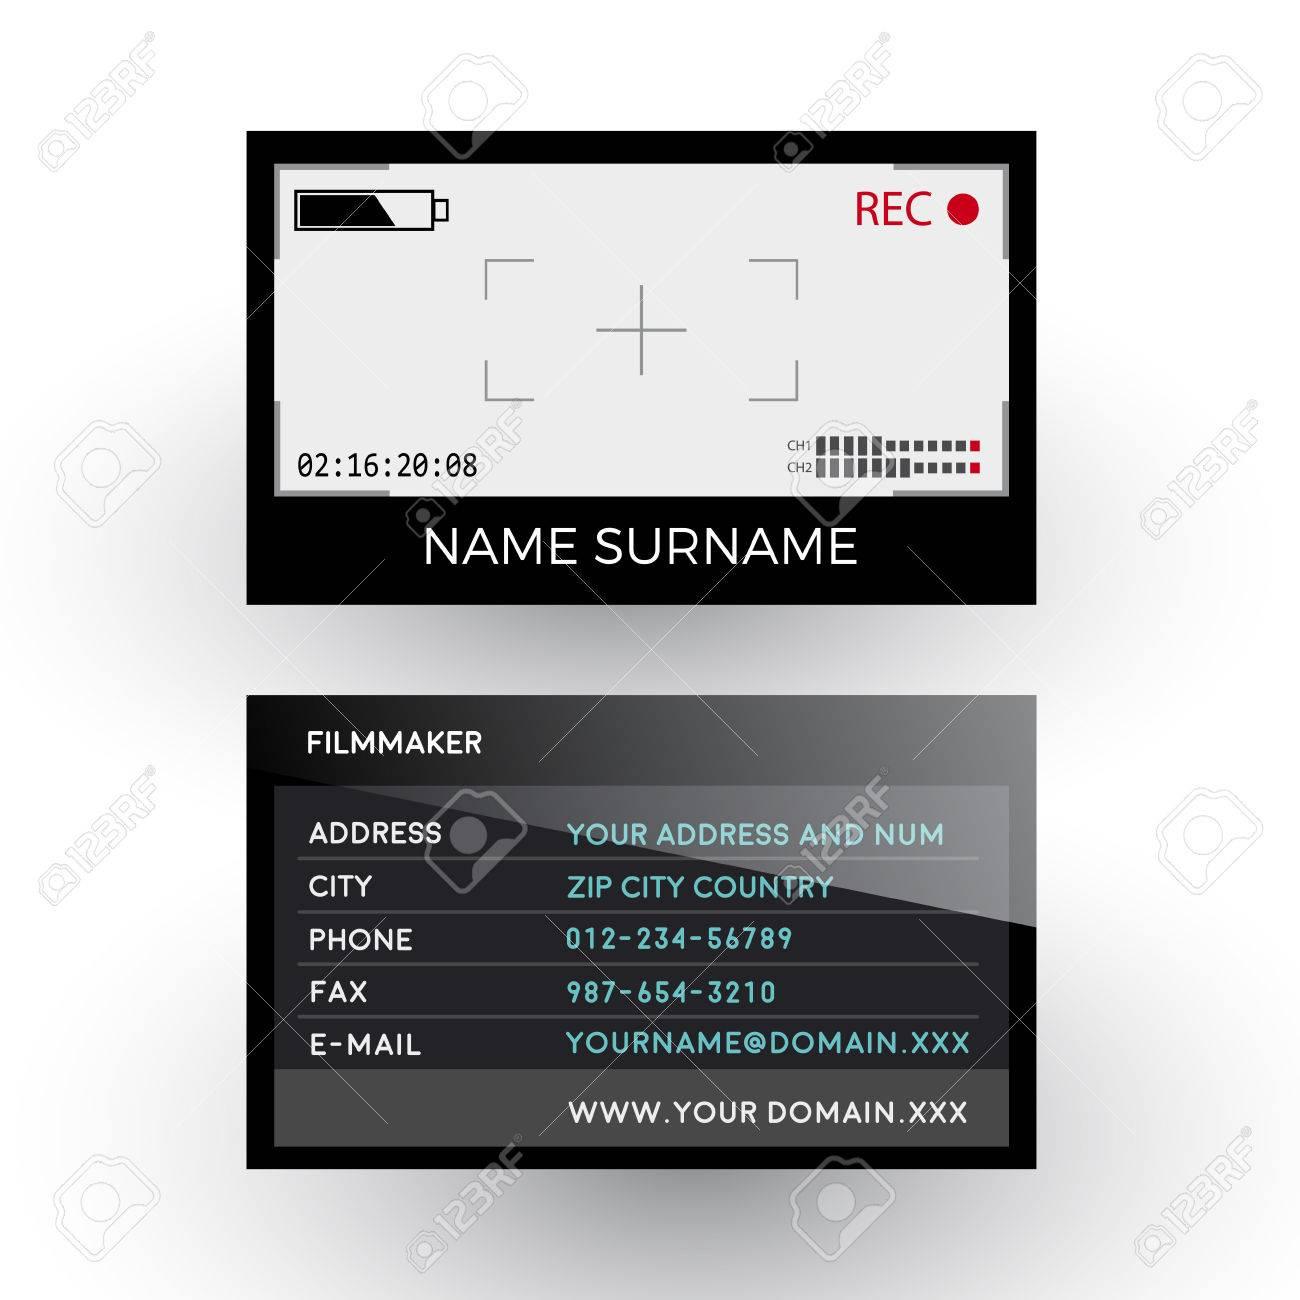 Excellent Videographer Business Card Images - Business Card Ideas ...